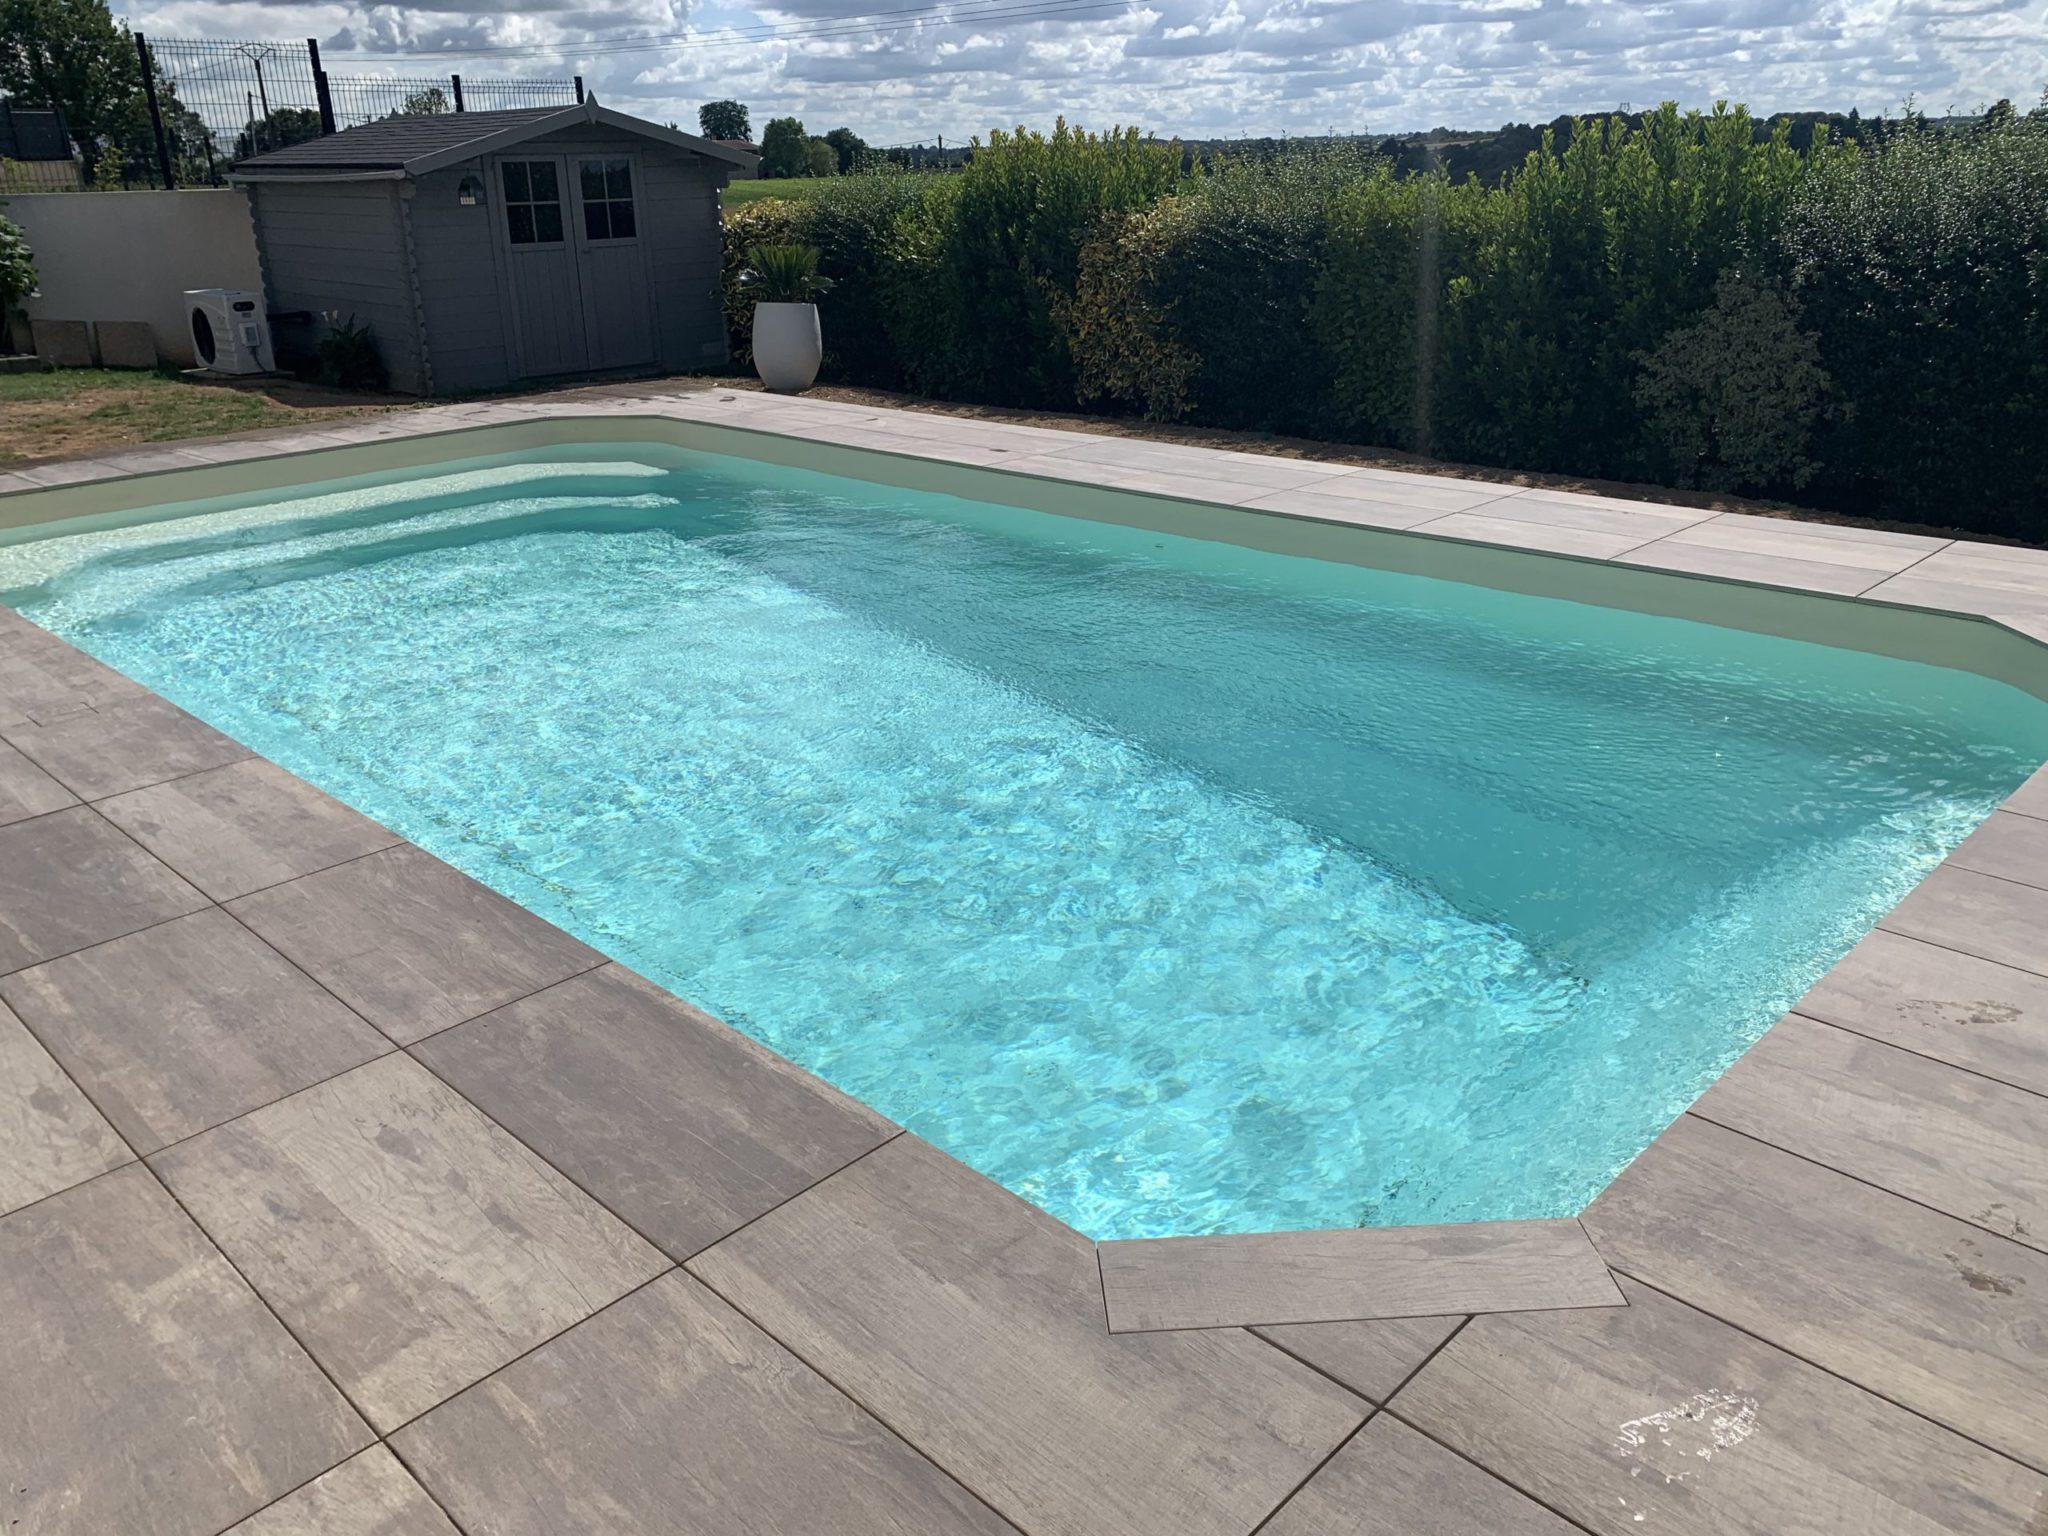 entreprise piscine cholet